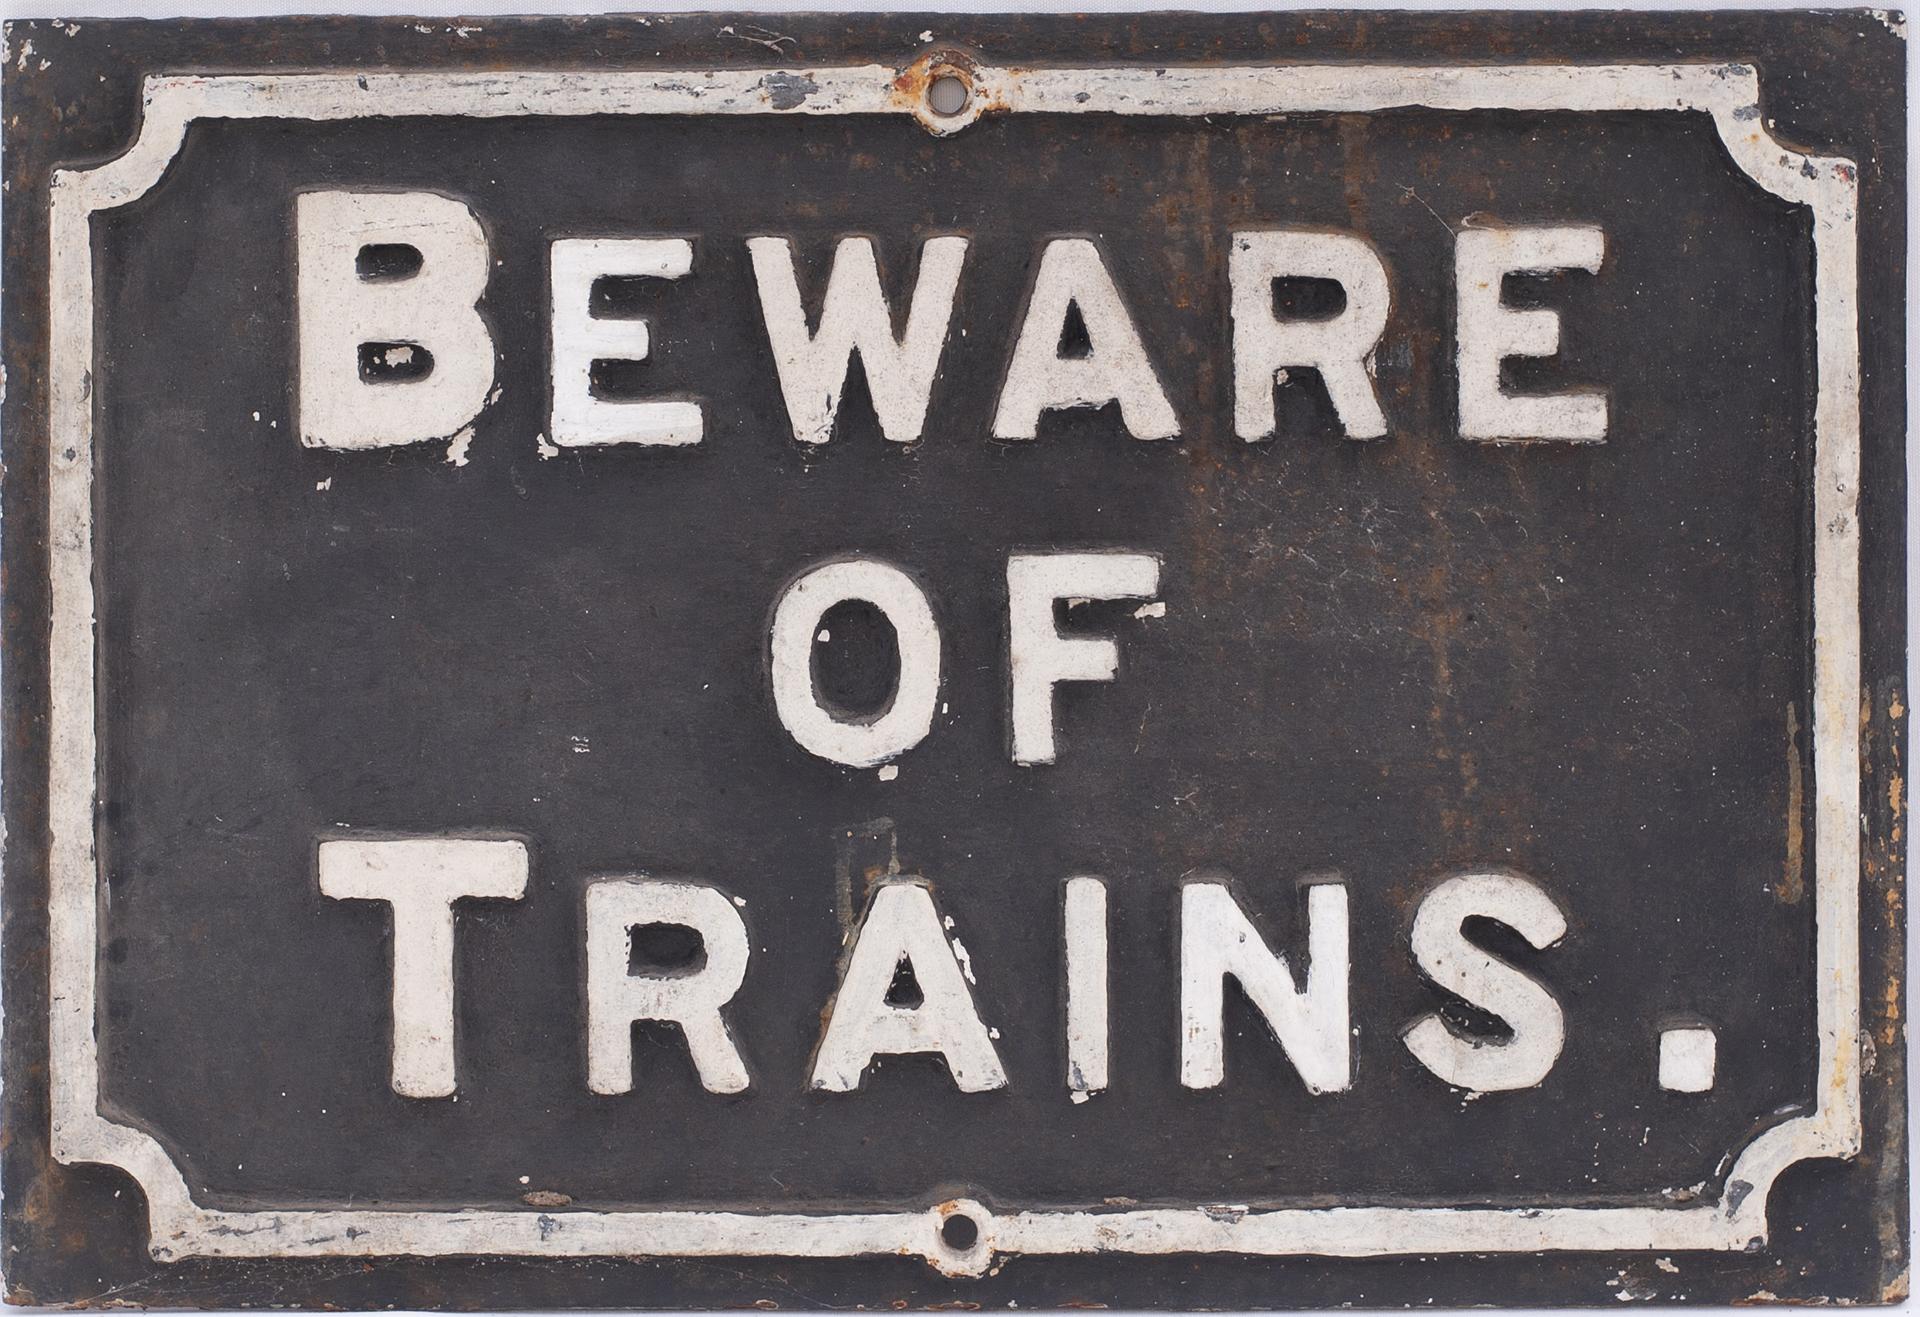 Midland Railway Cast iron sign. BEWARE OF TRAINS.